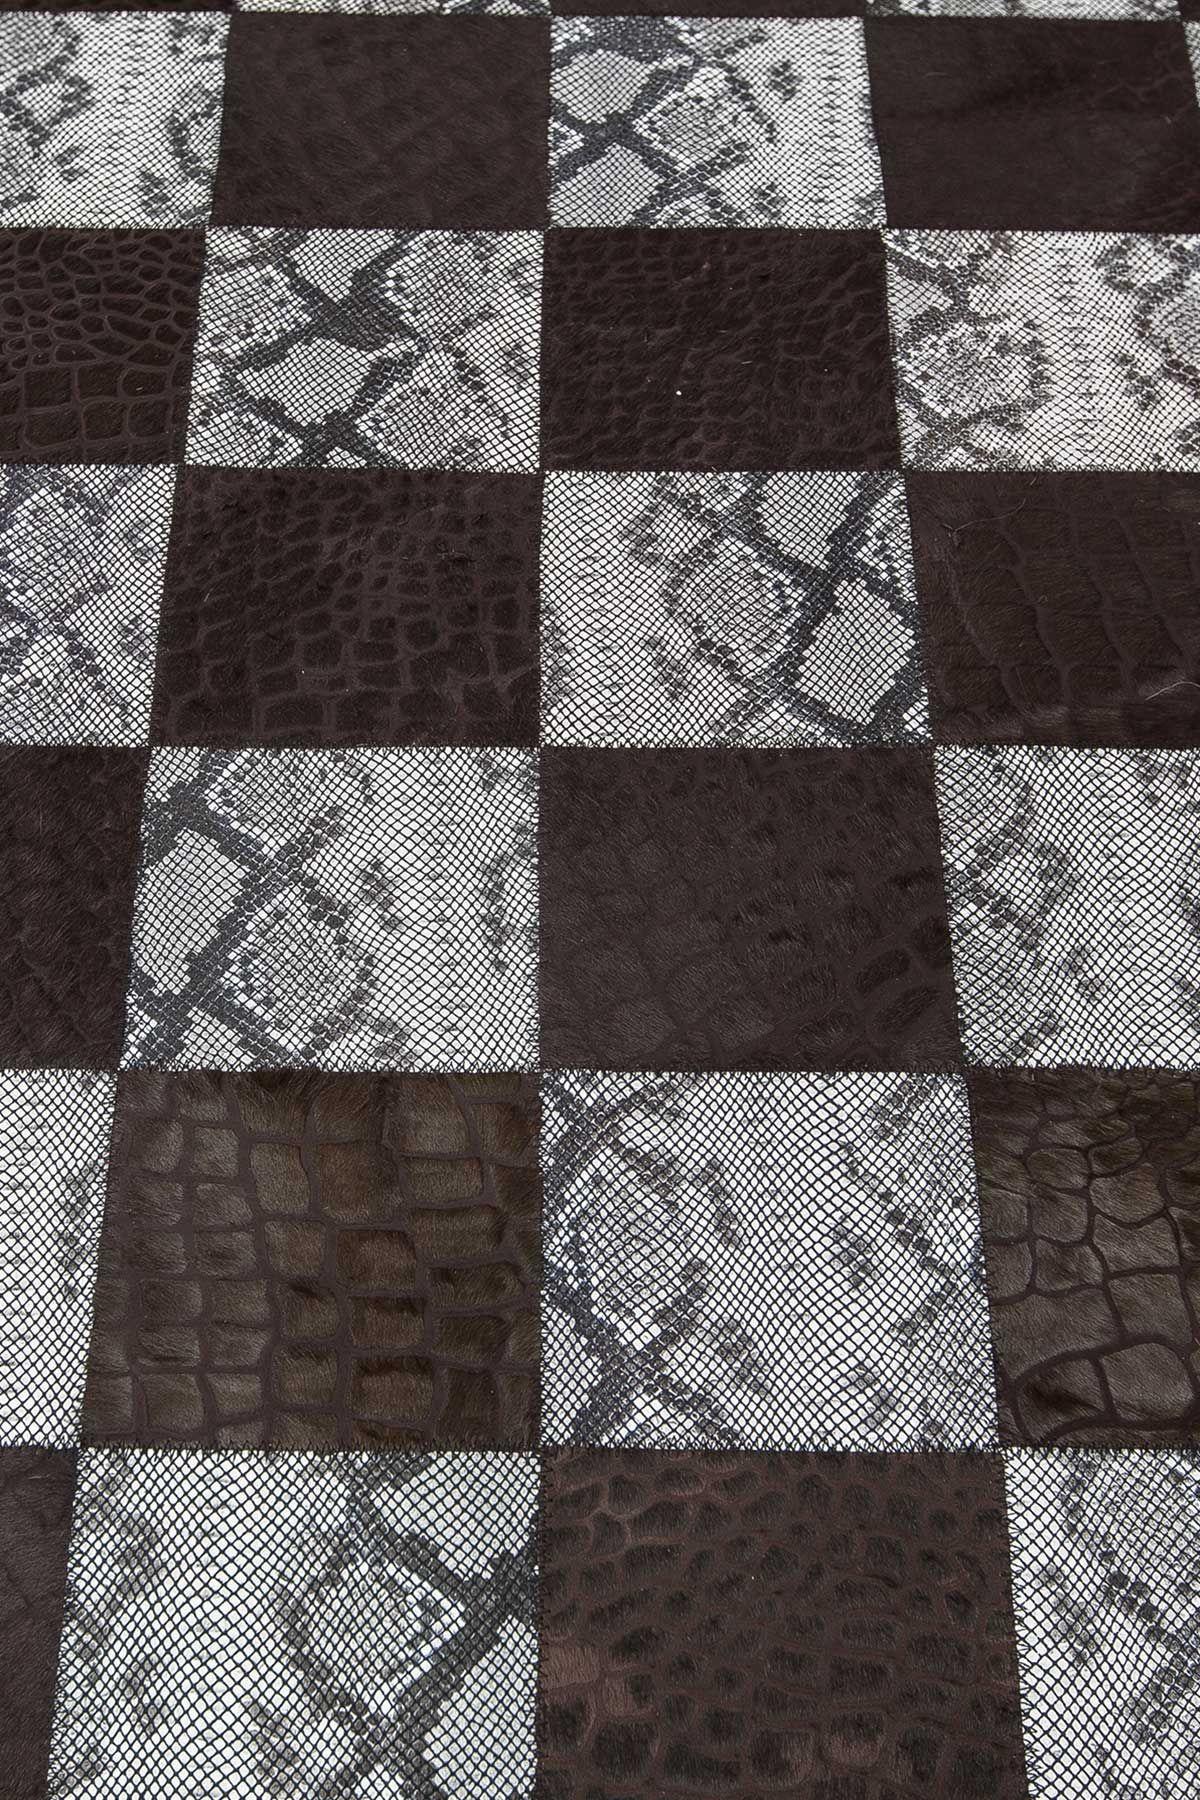 Erdogan Deri Calfskin Rug With Snake Square Pattern Brown